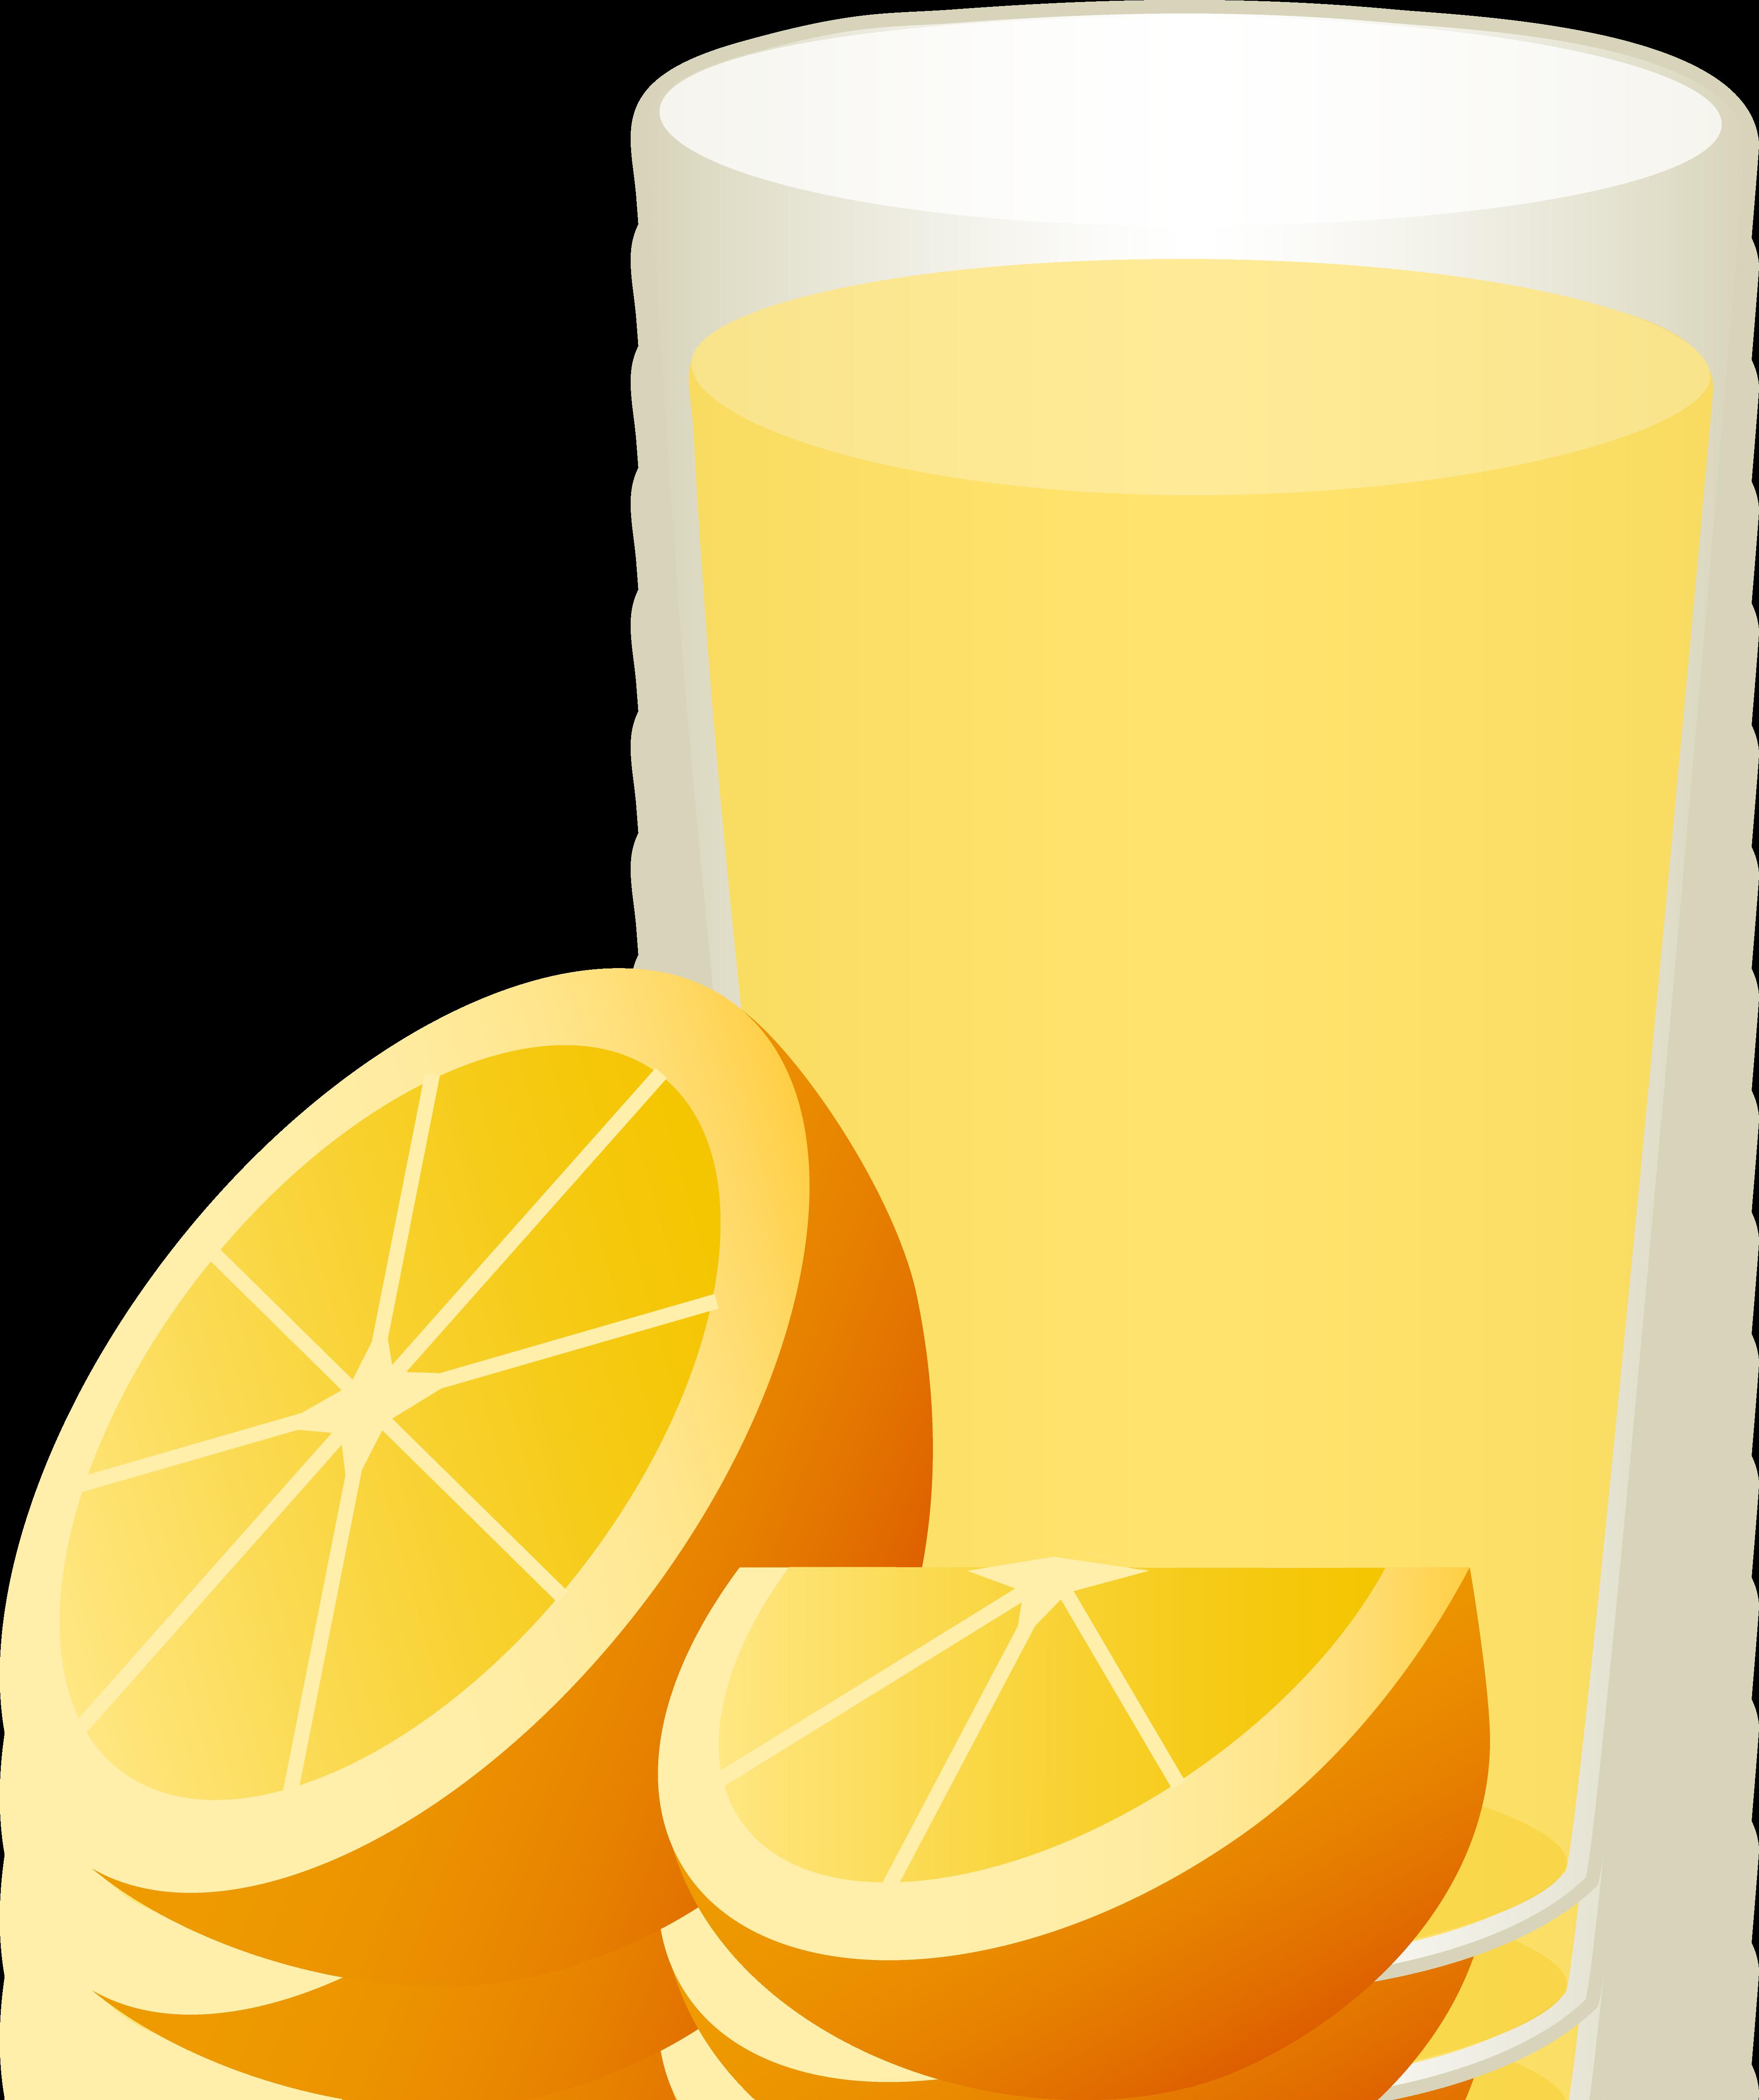 Glass of Orange Juice With Sliced Fruit.